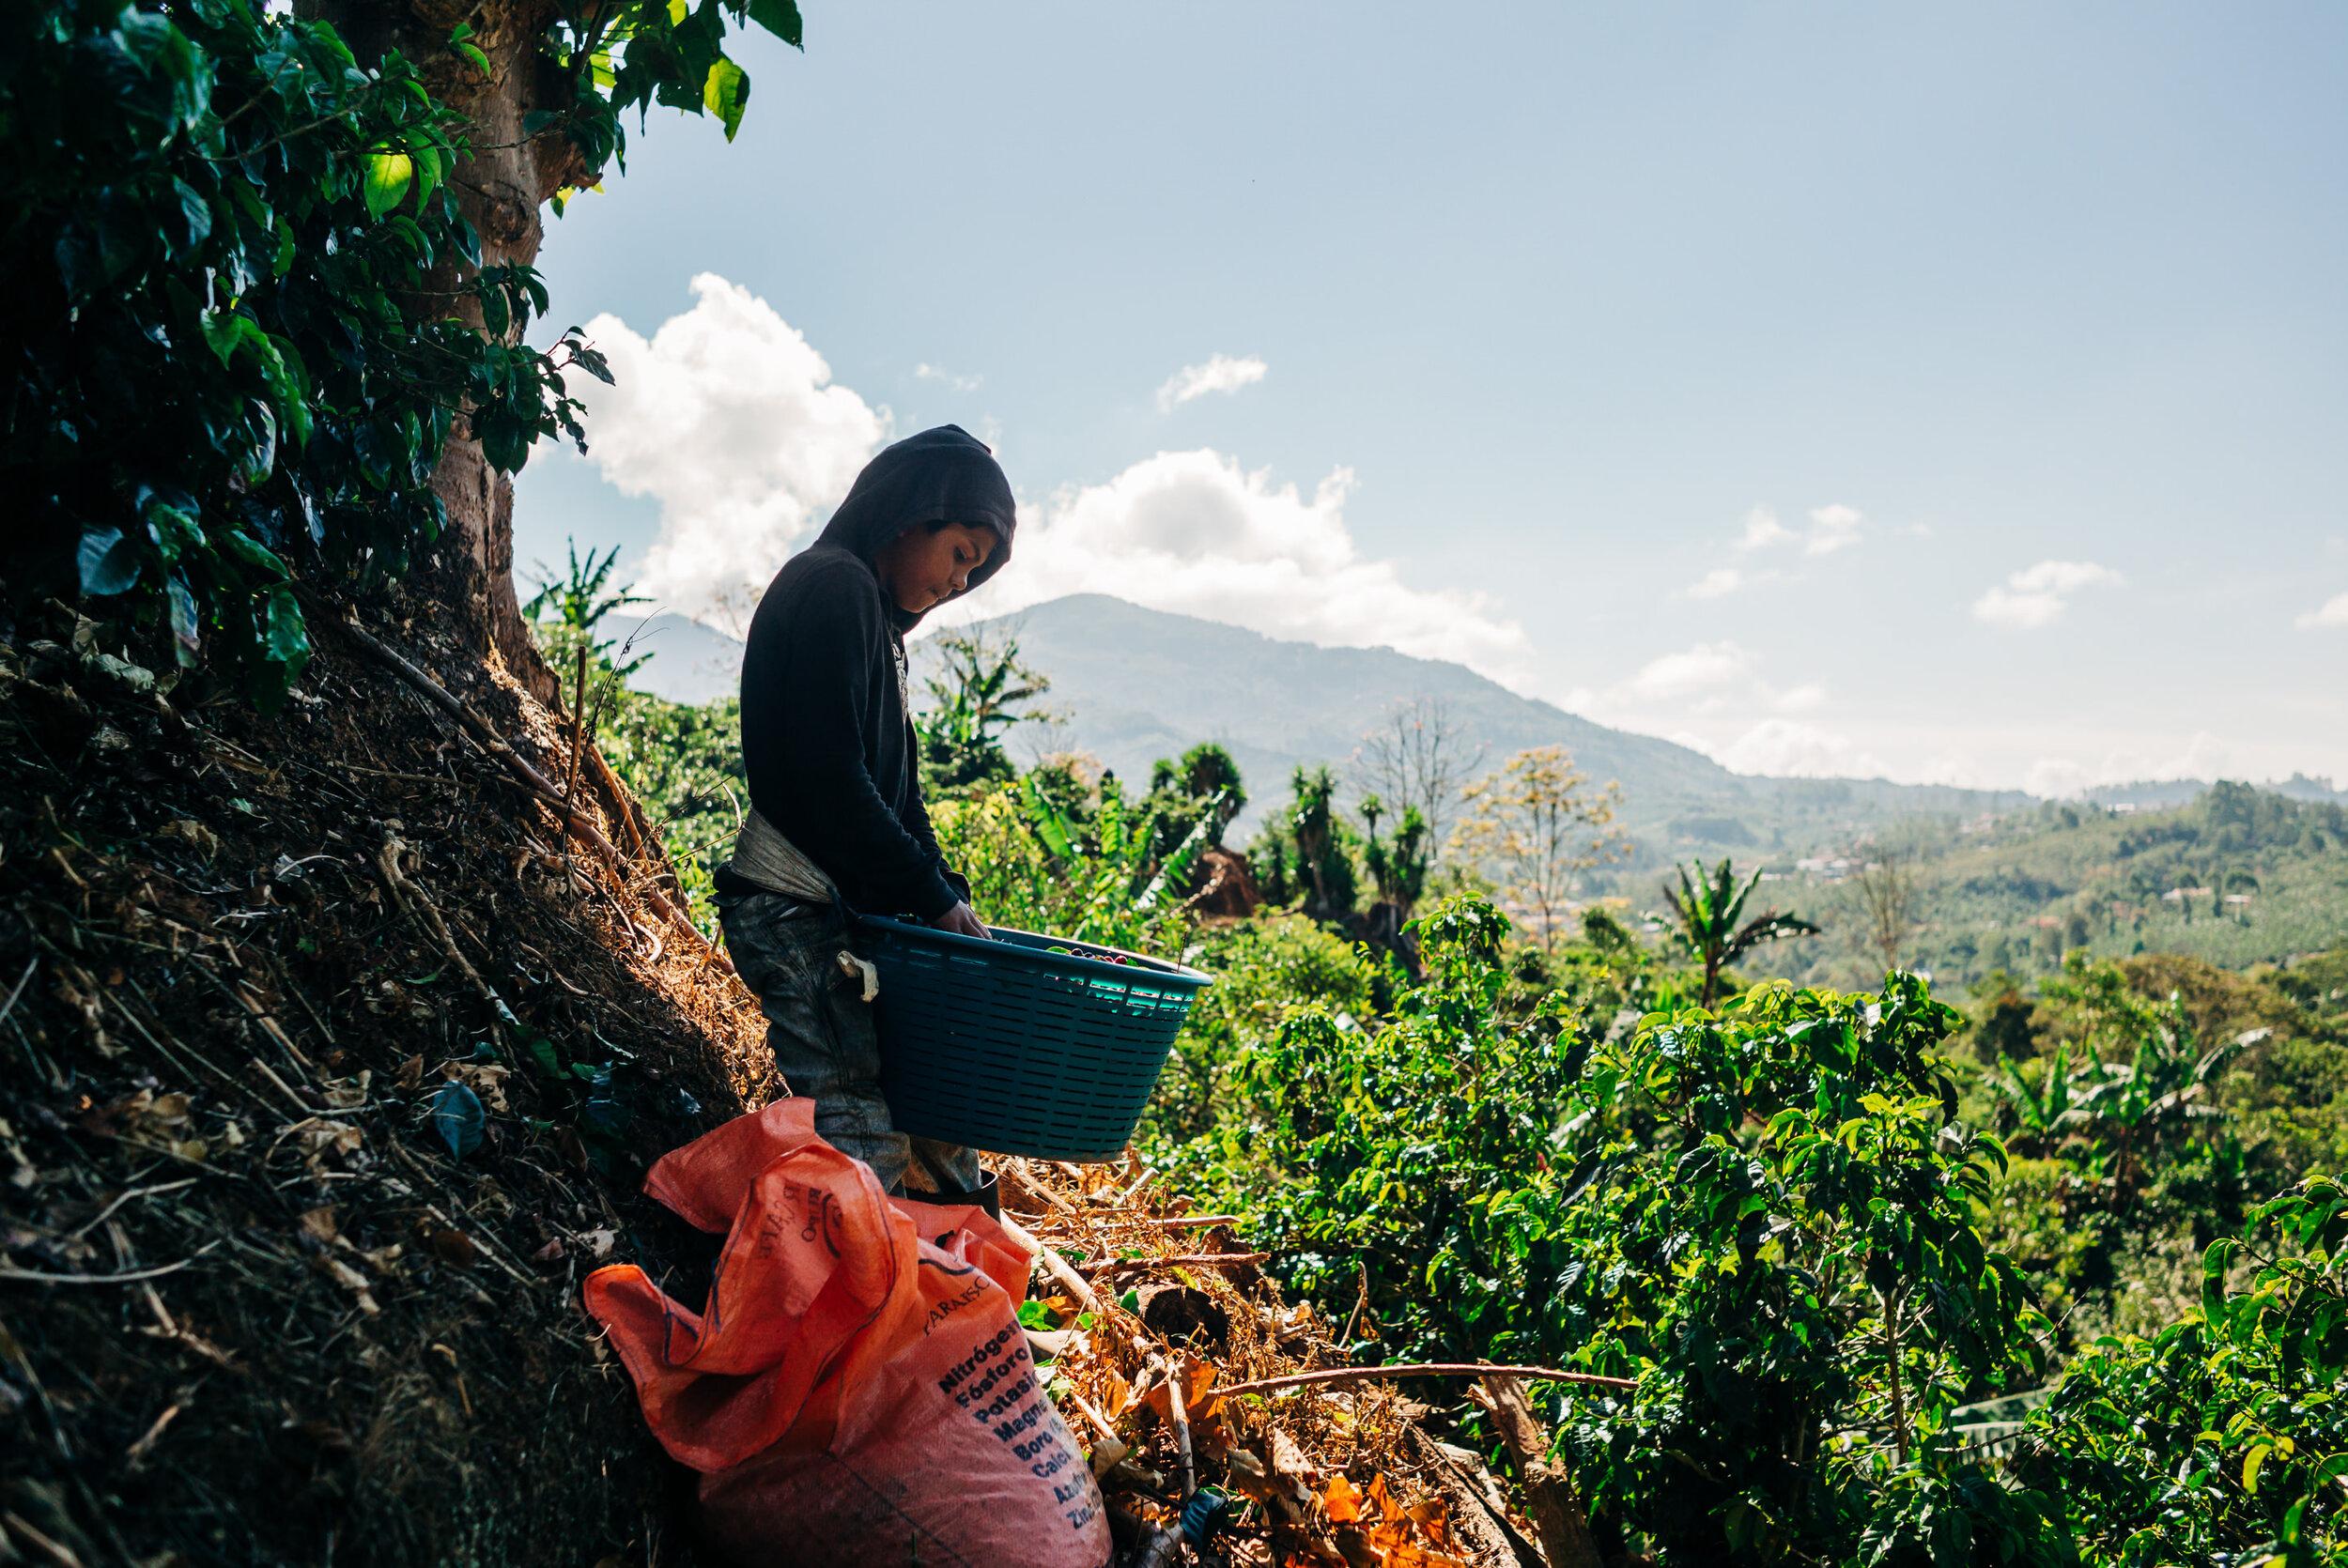 photojournalism-costa-rica-5.JPG